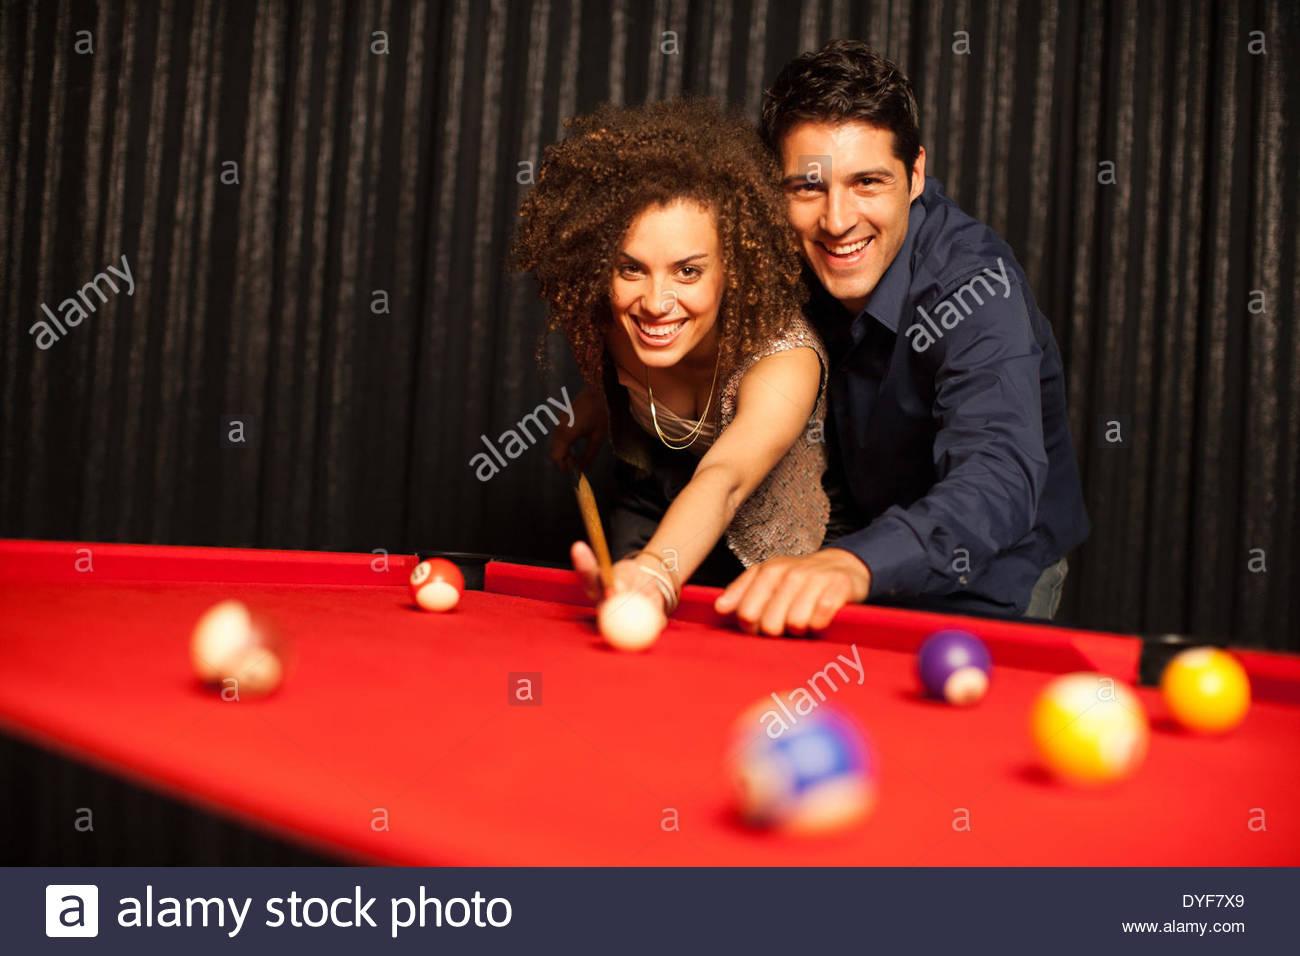 Couple playing pool - Stock Image